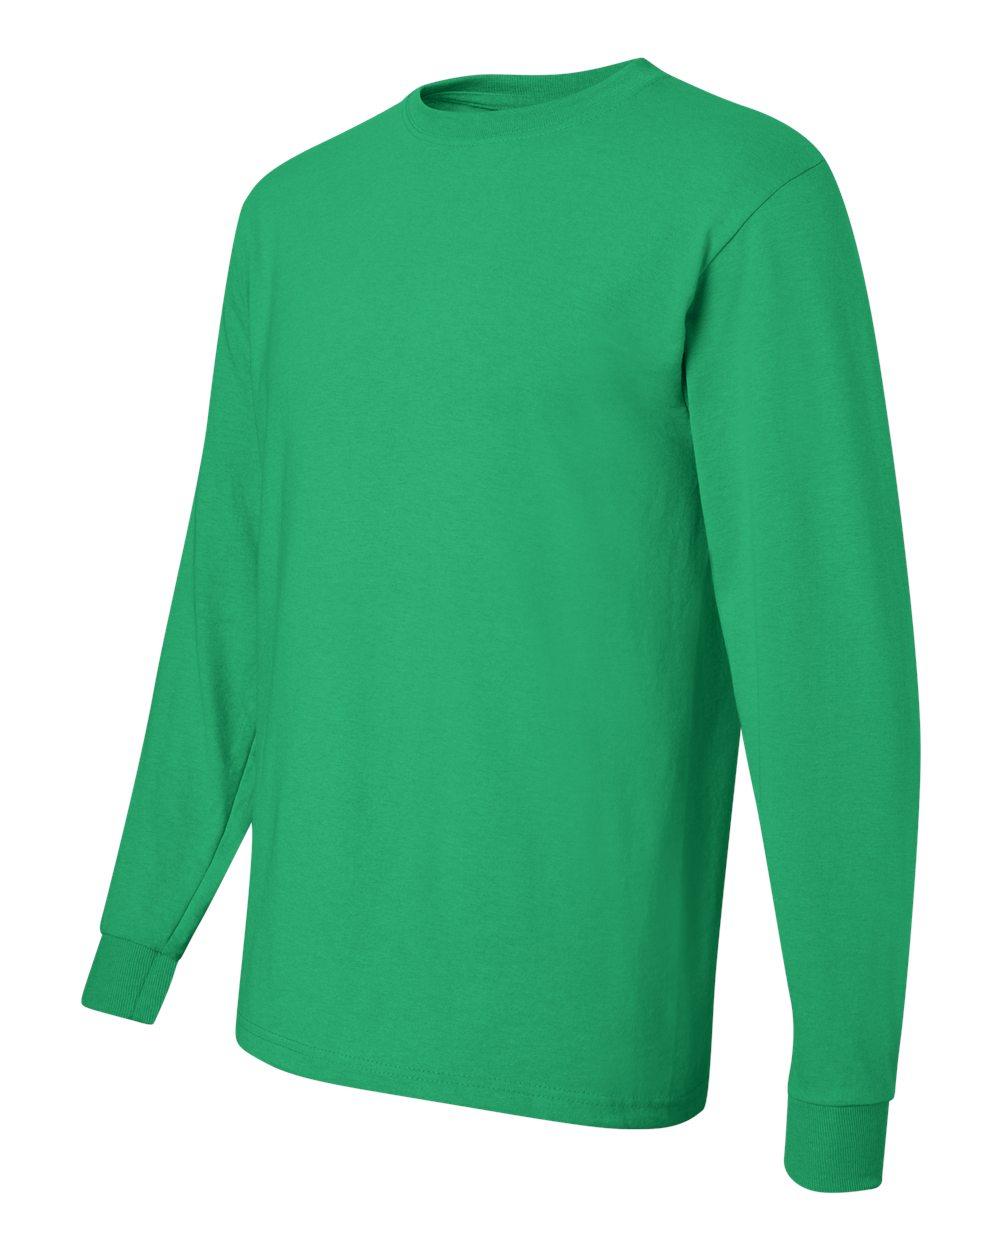 Heavyweight Cotton Long-Sleeve T-Shirt J Navy Jerzees 5.6 oz L